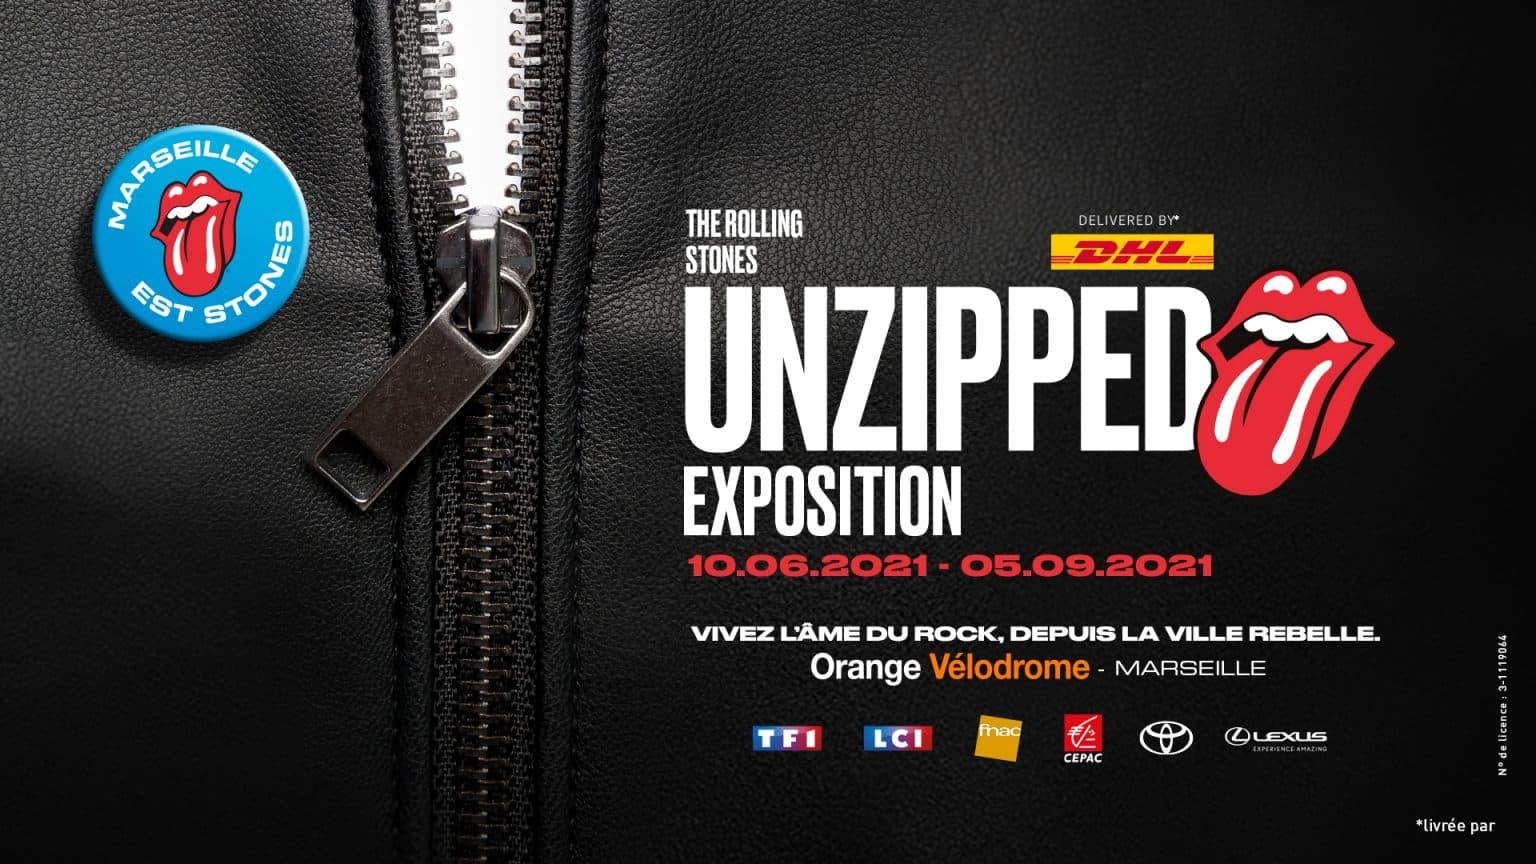 Unzipped - Rolling Stones